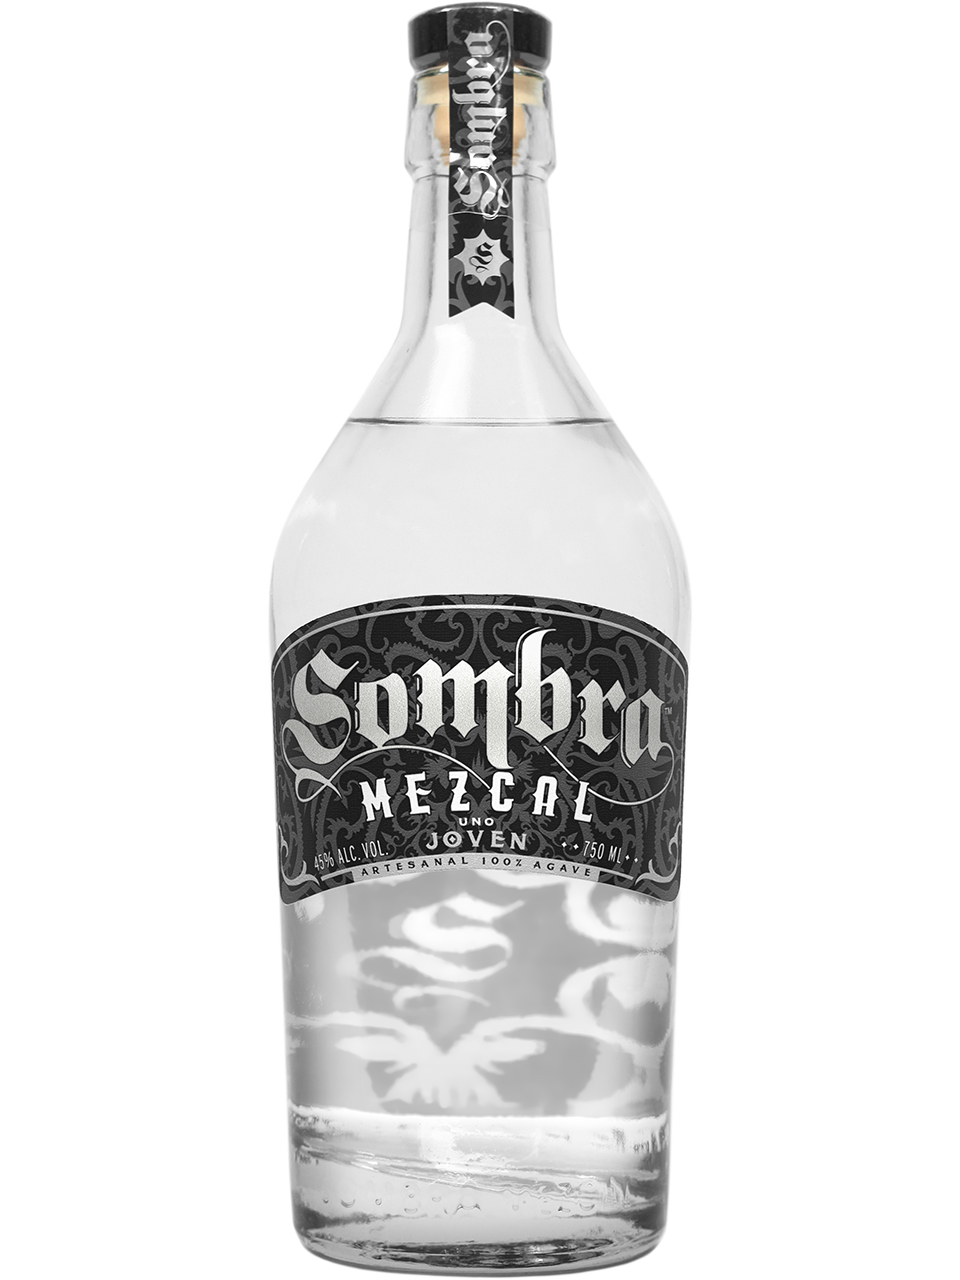 Sombra Mezcal Tequila